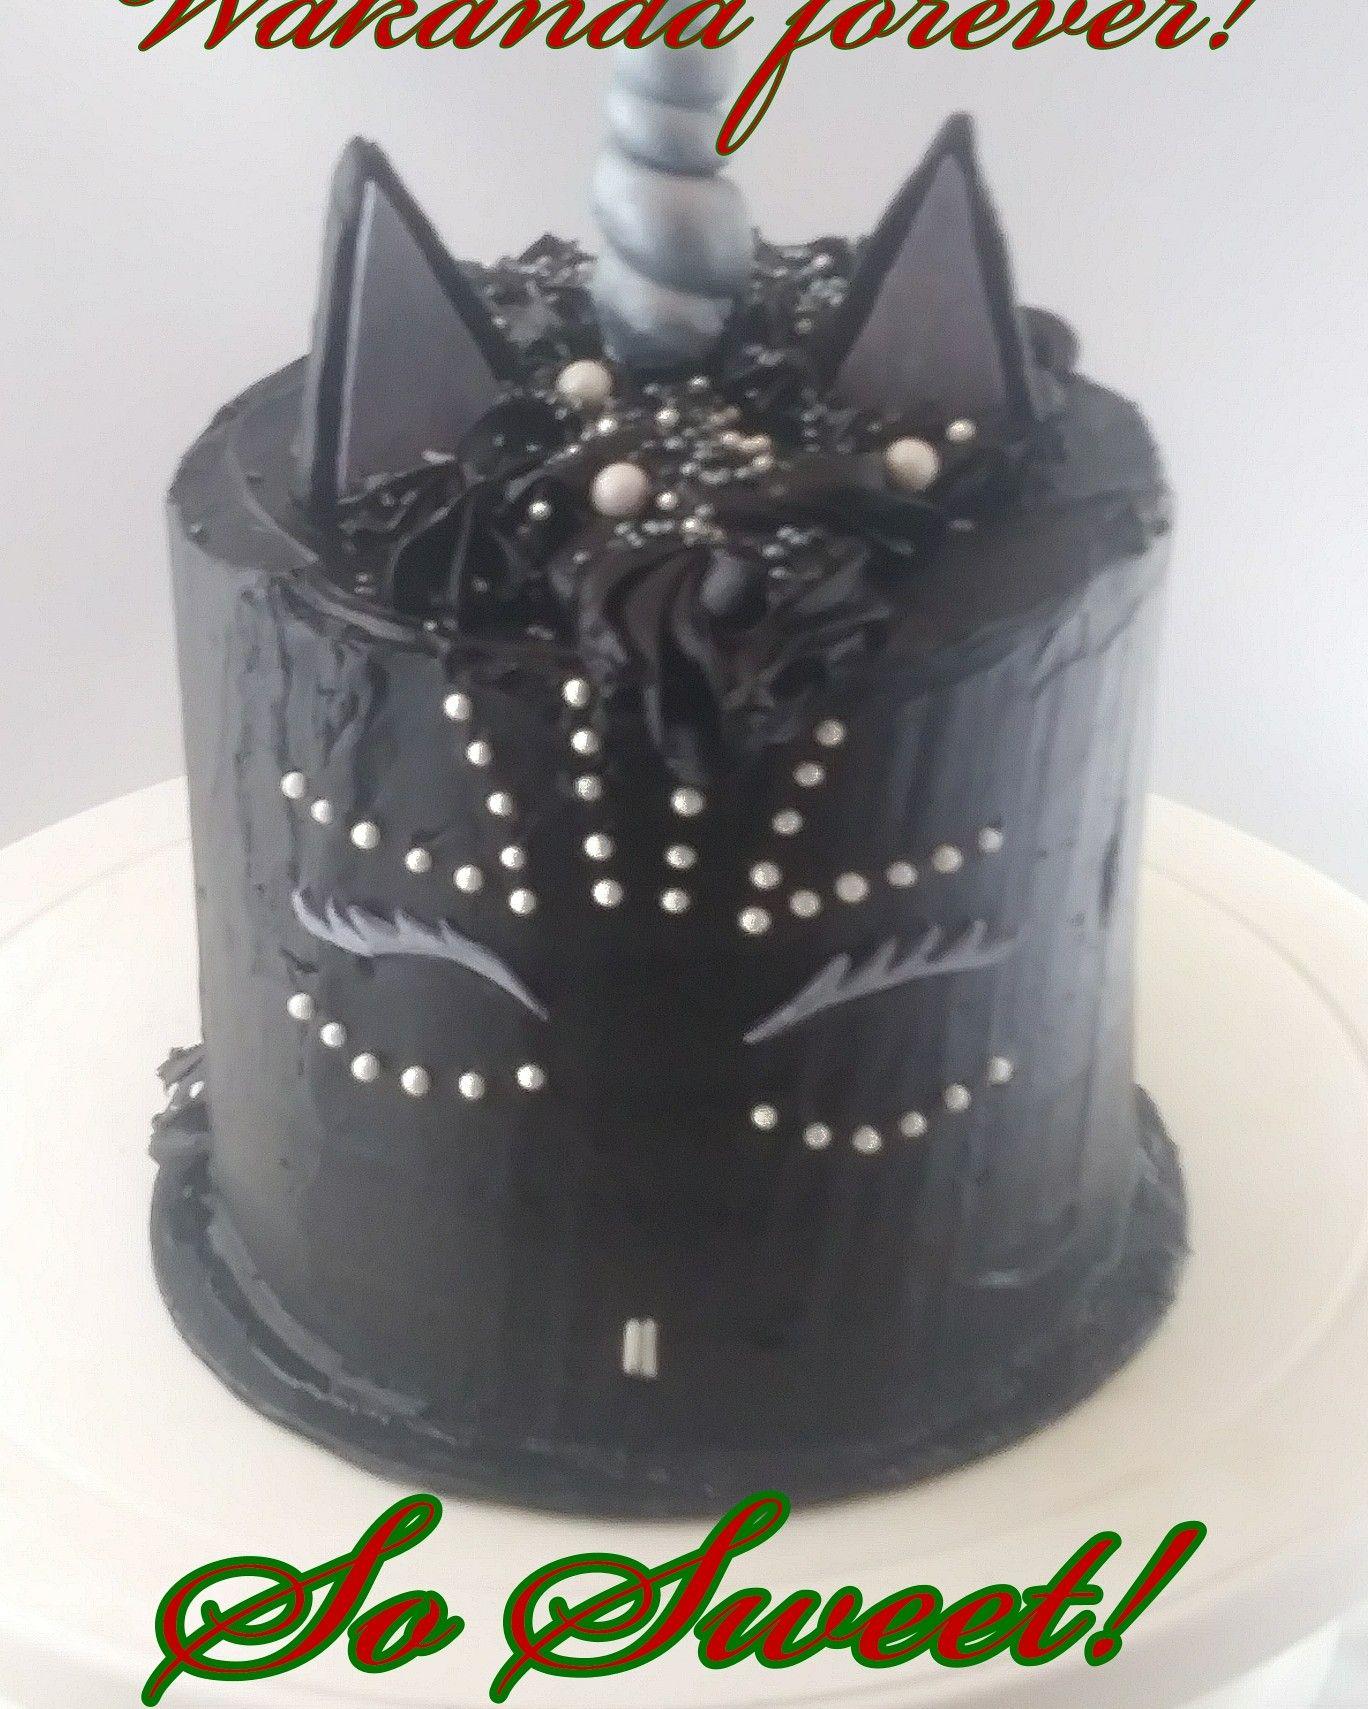 Shuri Black Panther Unicorn Cake In Buttercream 7th Birthday Party Ideas 16th Girl